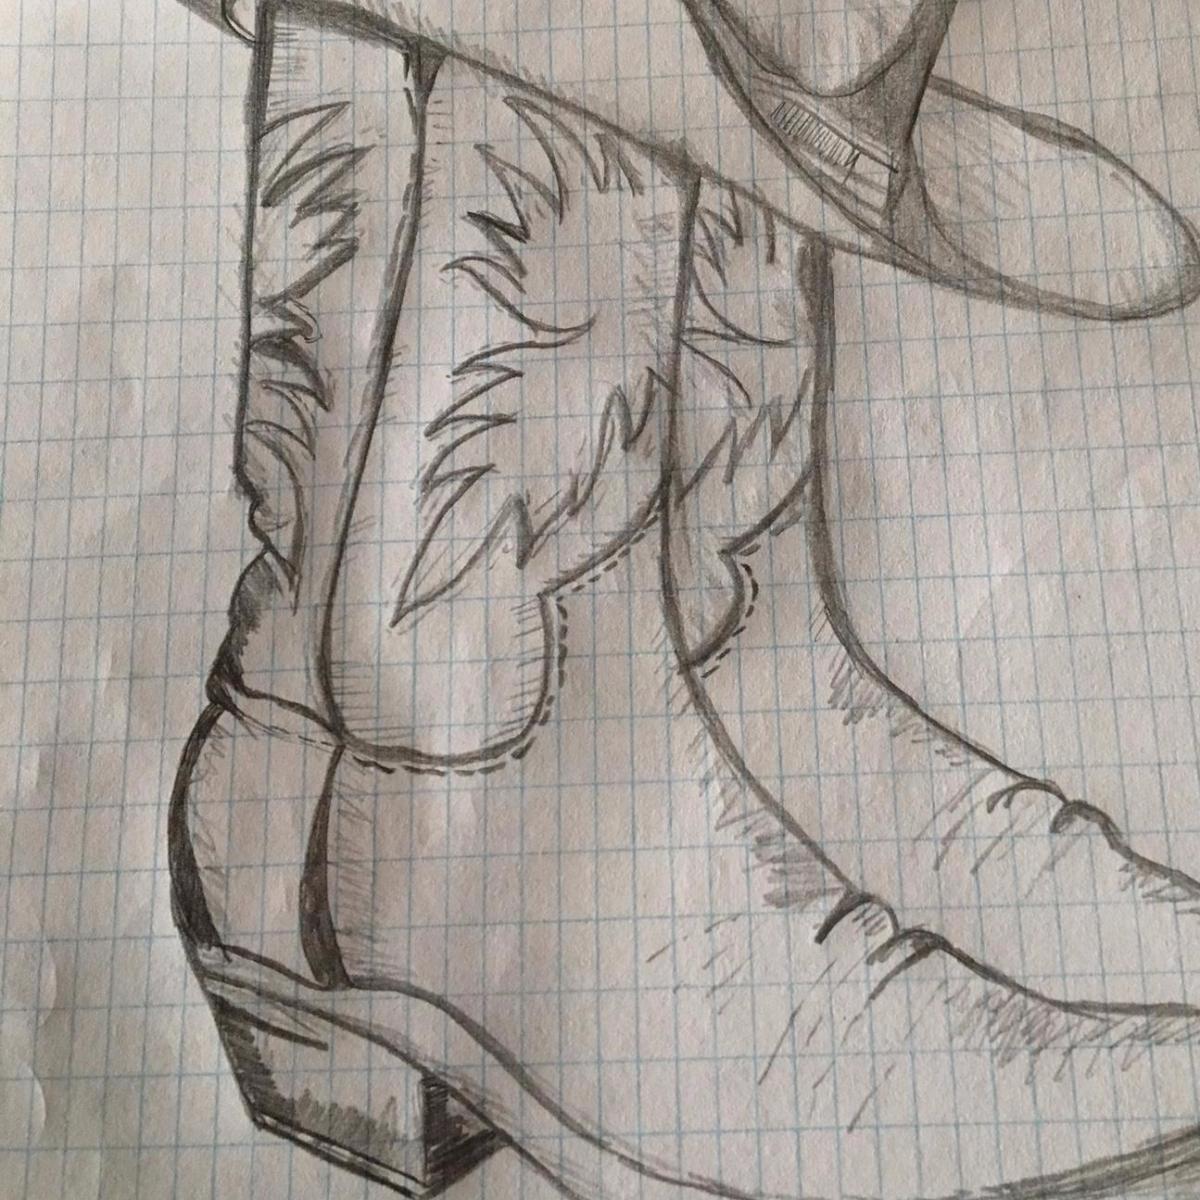 Cowboy Boots drawning